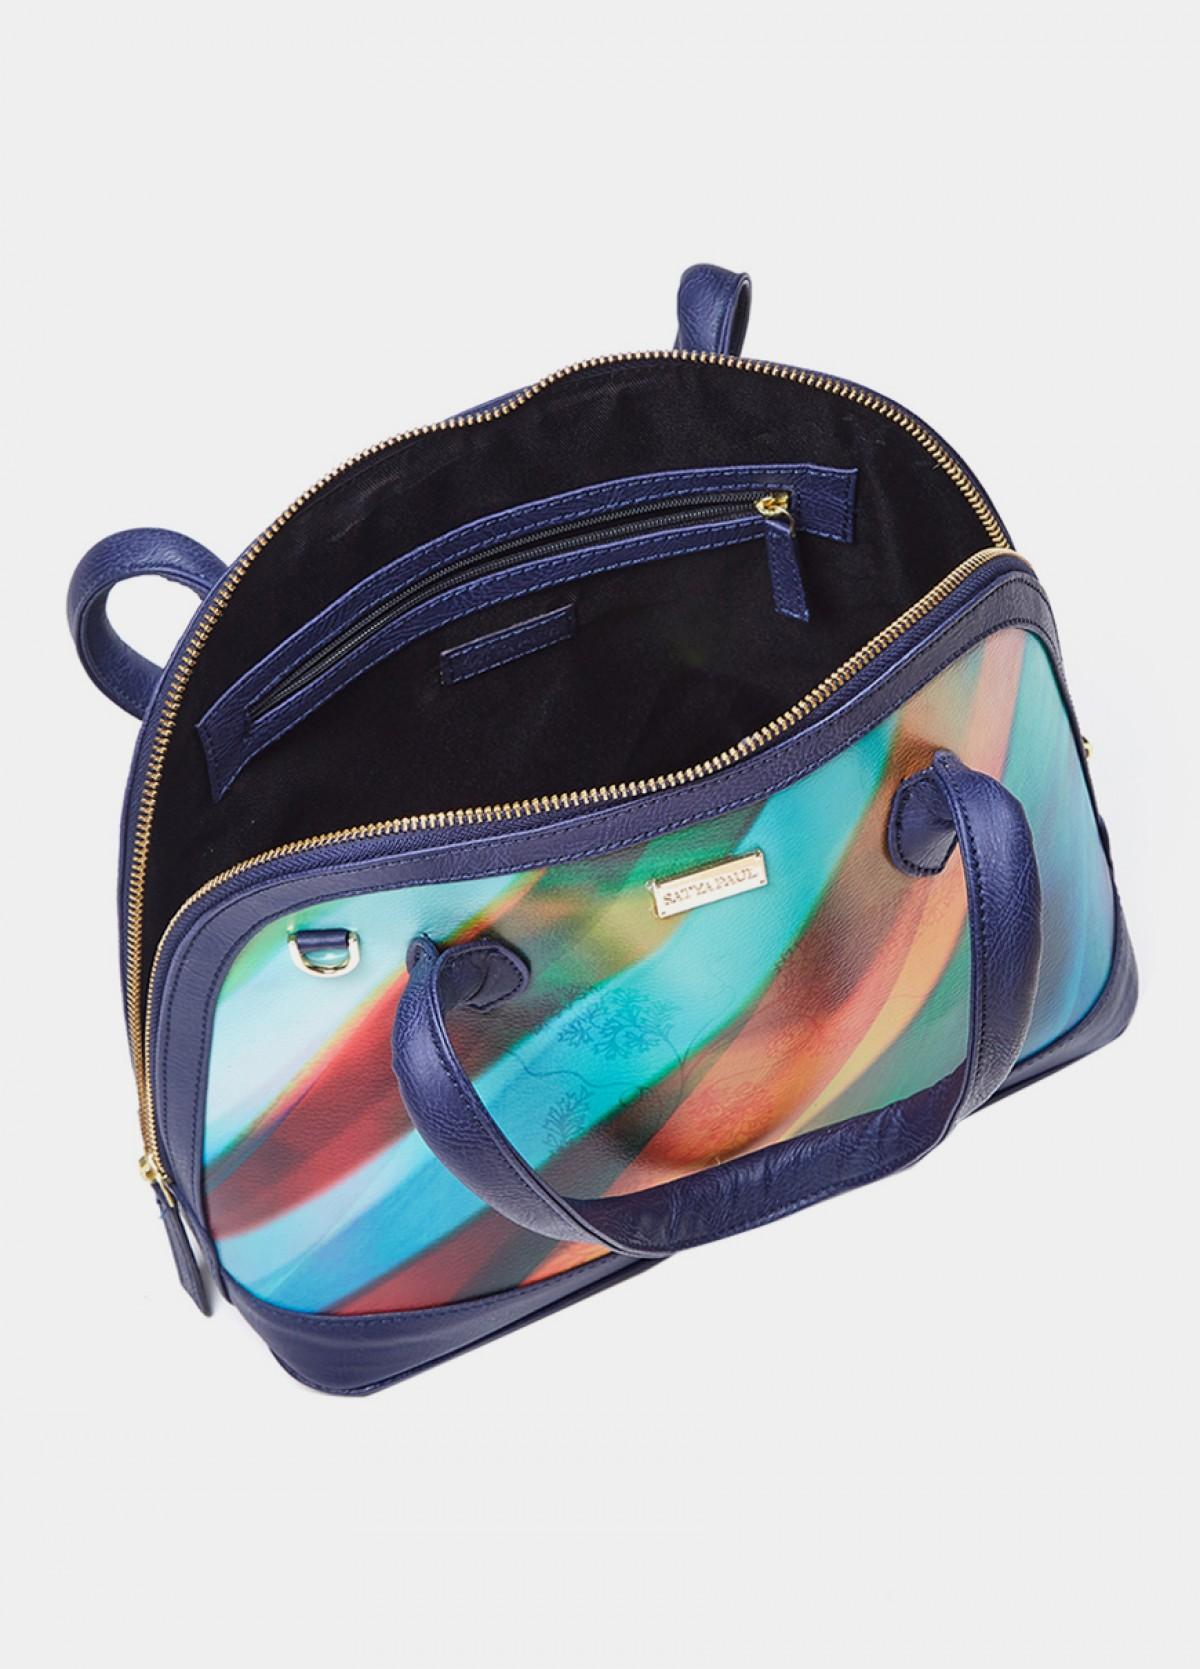 The Printed D Shape Bag